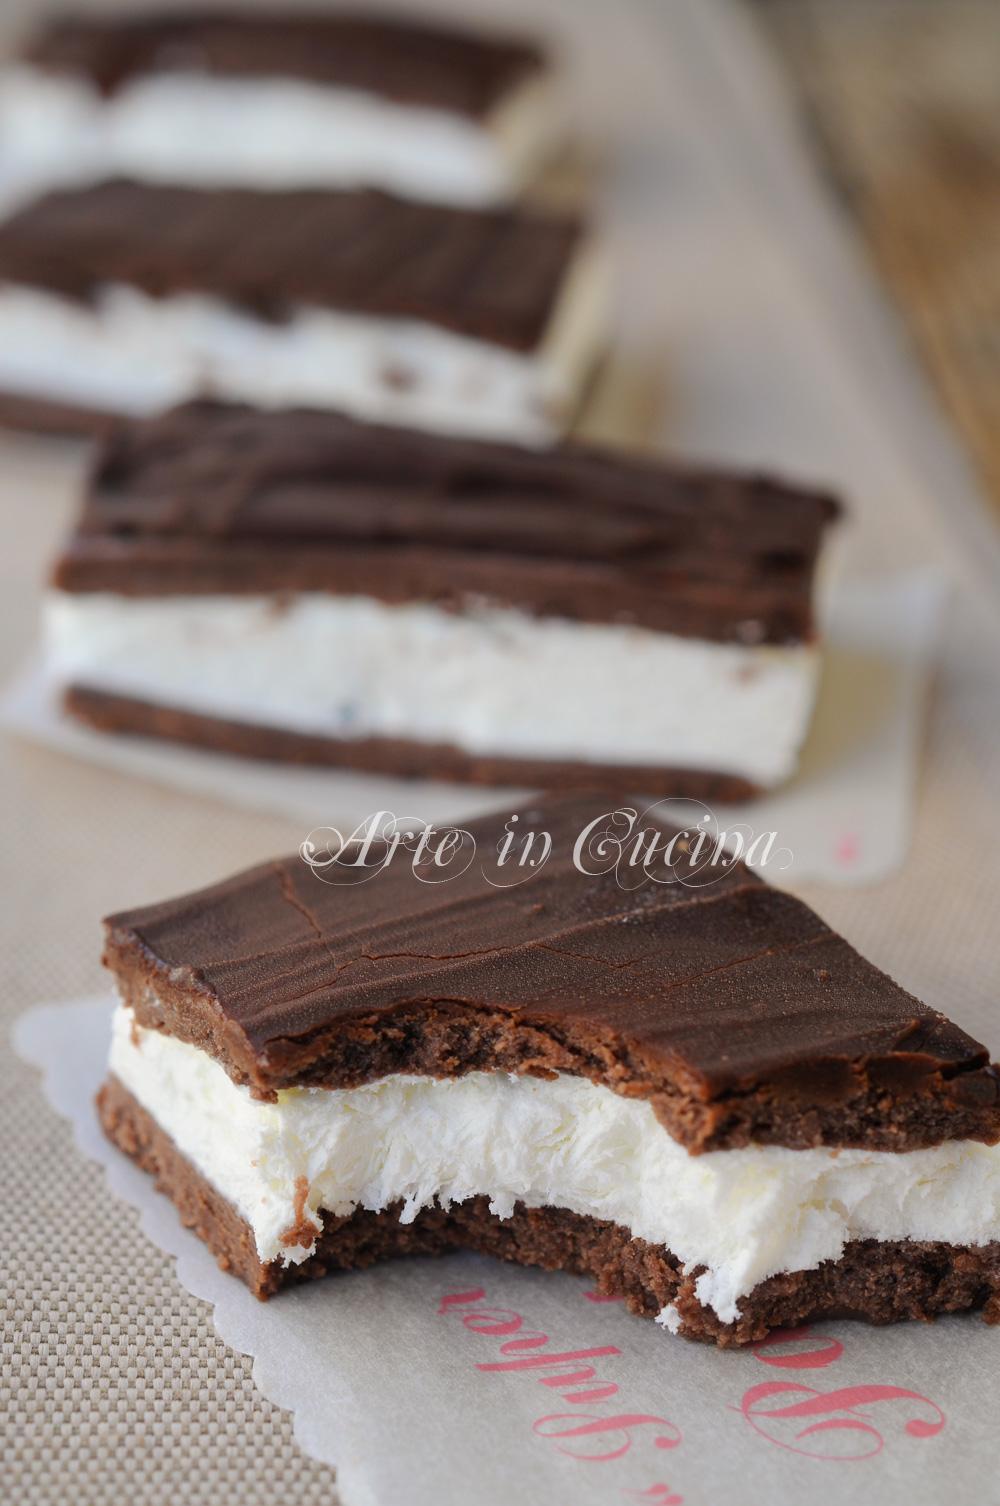 Mini cheesecake pinguino ricetta veloce fredda vickyart arte in cucina